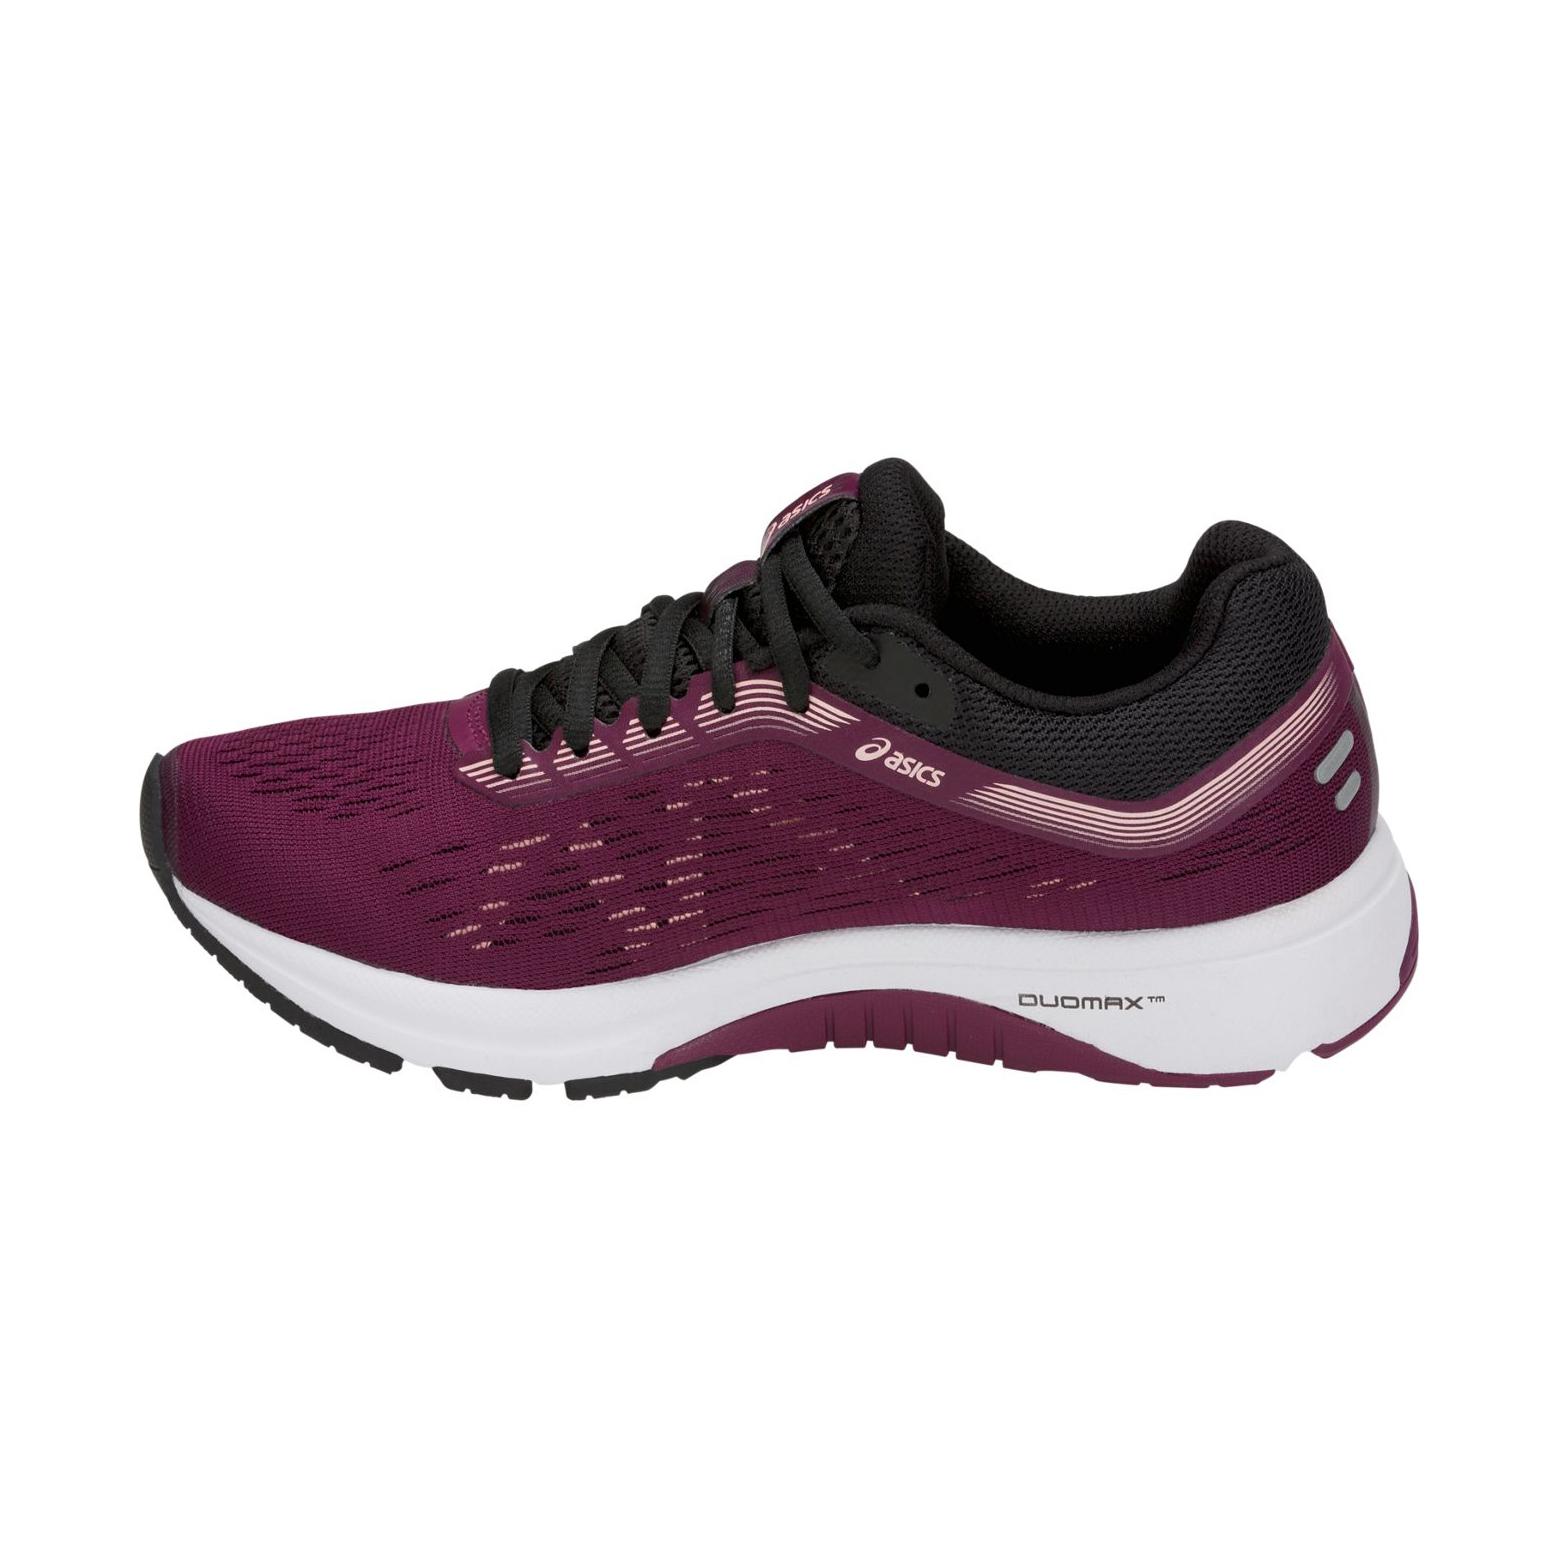 Asics GT-1000 7 Women s Running Shoes- Black Stone Grey  aa11b6ab9c